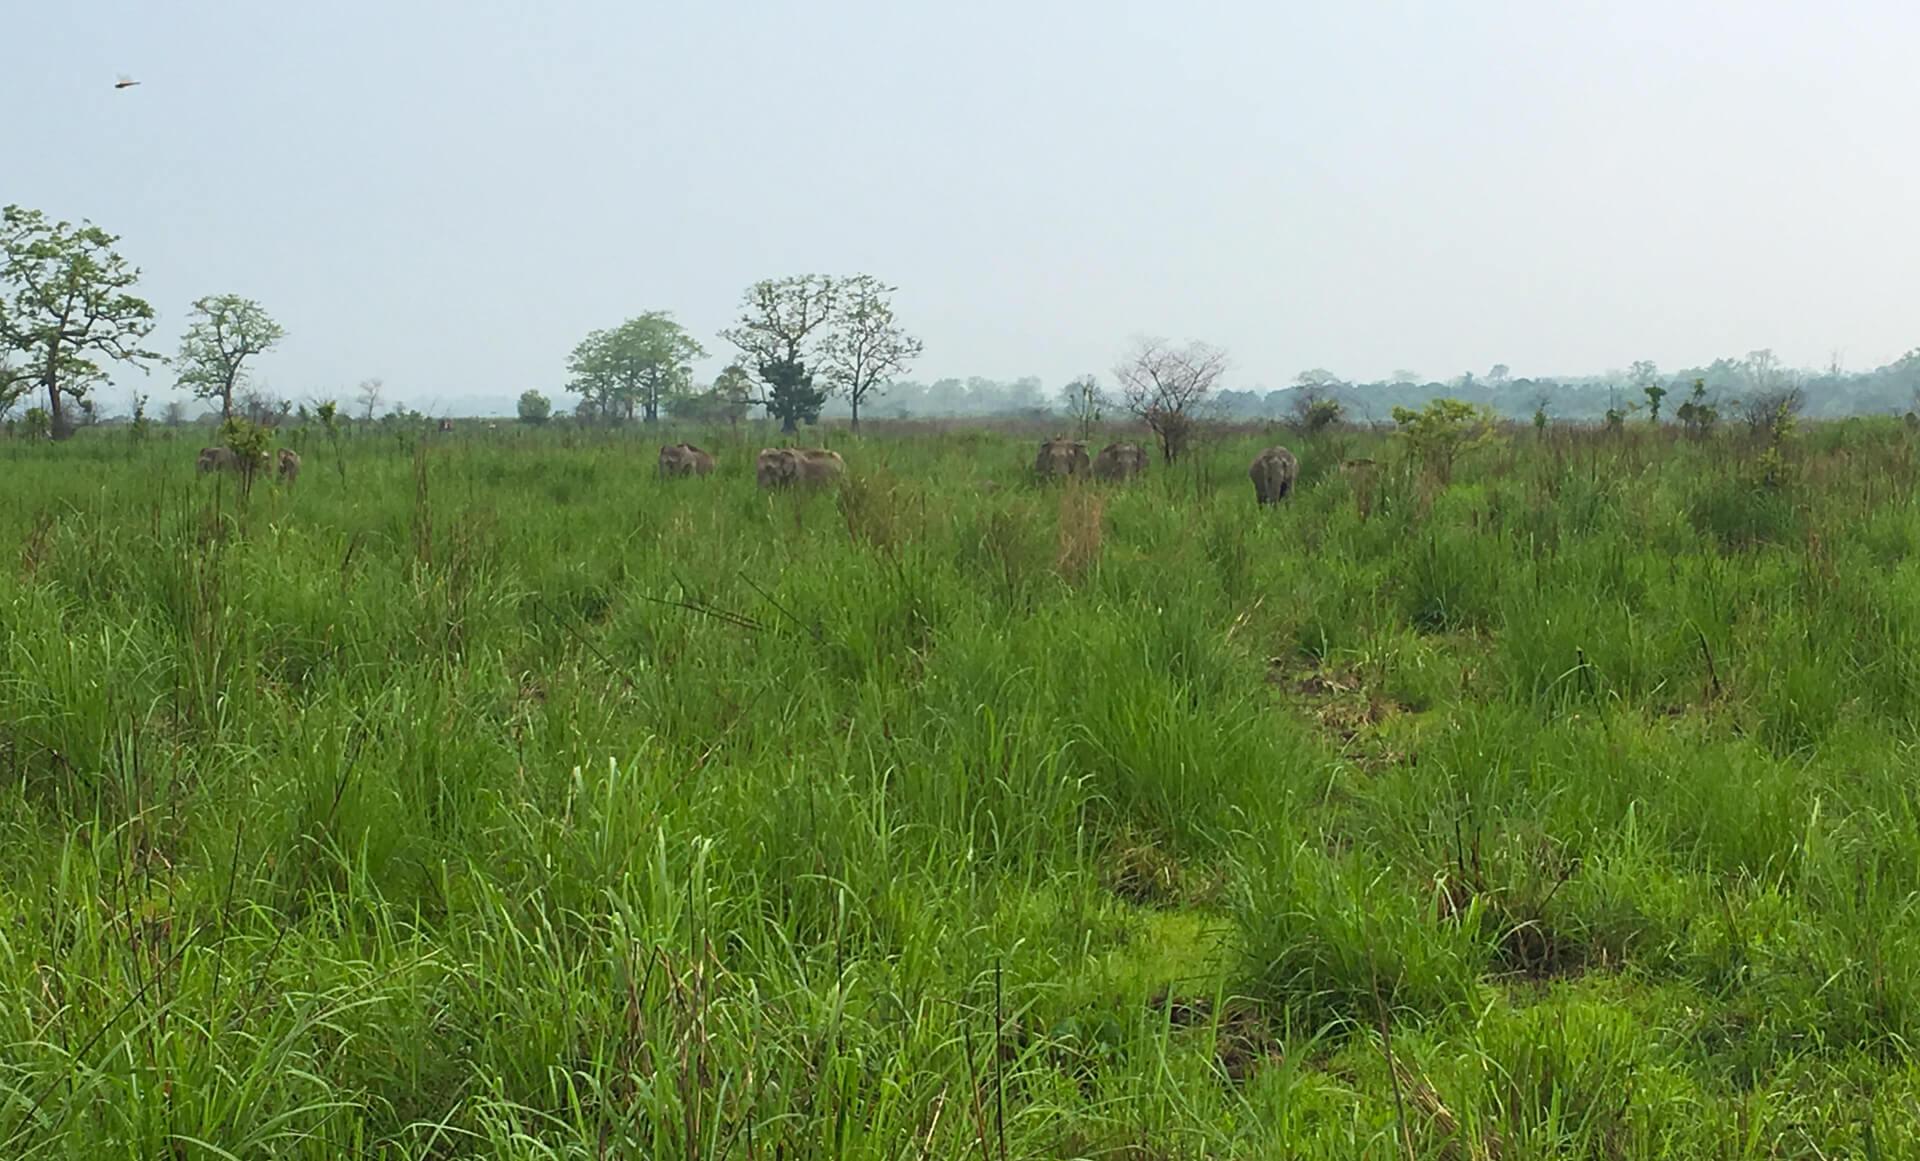 Elephants grazing in the Kaziranga National Park.